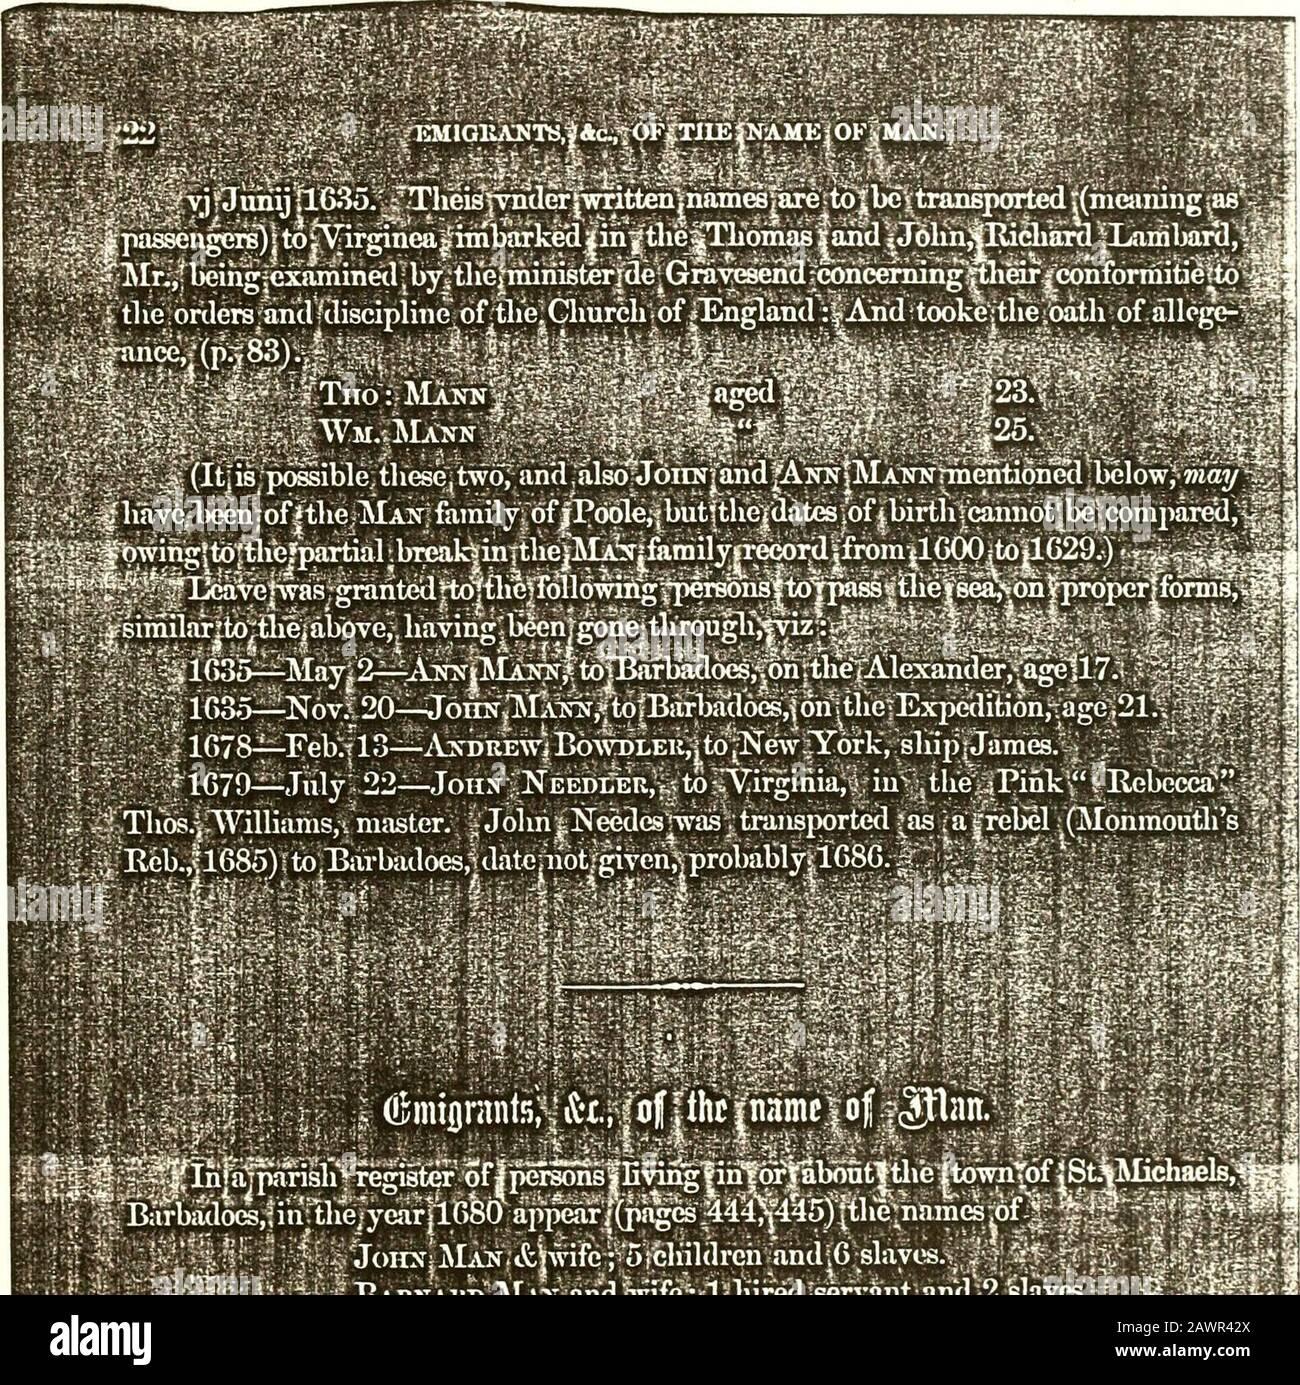 Record delle famiglie Man, Needles (Nedels) e Hambleton...1495-1876 . 1.1/, A J.-Ail C 1.1 .III ^ HllV/ij =-*. Ji yp~ga? :TIEK IMAST* FAMIEY|in |NEW|ENGlU>n>.: TF-proof/of fcl .-SKftB pointe^jJohni|Mananne/|Genk ;to^i^andjof|3aTnaic^uring^le^namcpvmby|£]iet6ne(vritingjtheH^^, Jacheis ^1, Jbeleibs o -^S^pif -^pif -^pif), it 1IkhVdler.s -^pifjs, s, it s•, it s, it s, it s, it  , s, s, s, s, s, s, s, s, s, s, s, s, s, s, s, s, s, s, s, s, s, s, s, s, s, s, s, s, s, s, s, s, s, s, s, s, s, s, : He| isfmeritiohed j^as .oijieifof jthe| sondaggio ois^of Eehobotli^Jiine 9,^1(383^1M..aiidas having Foto Stock